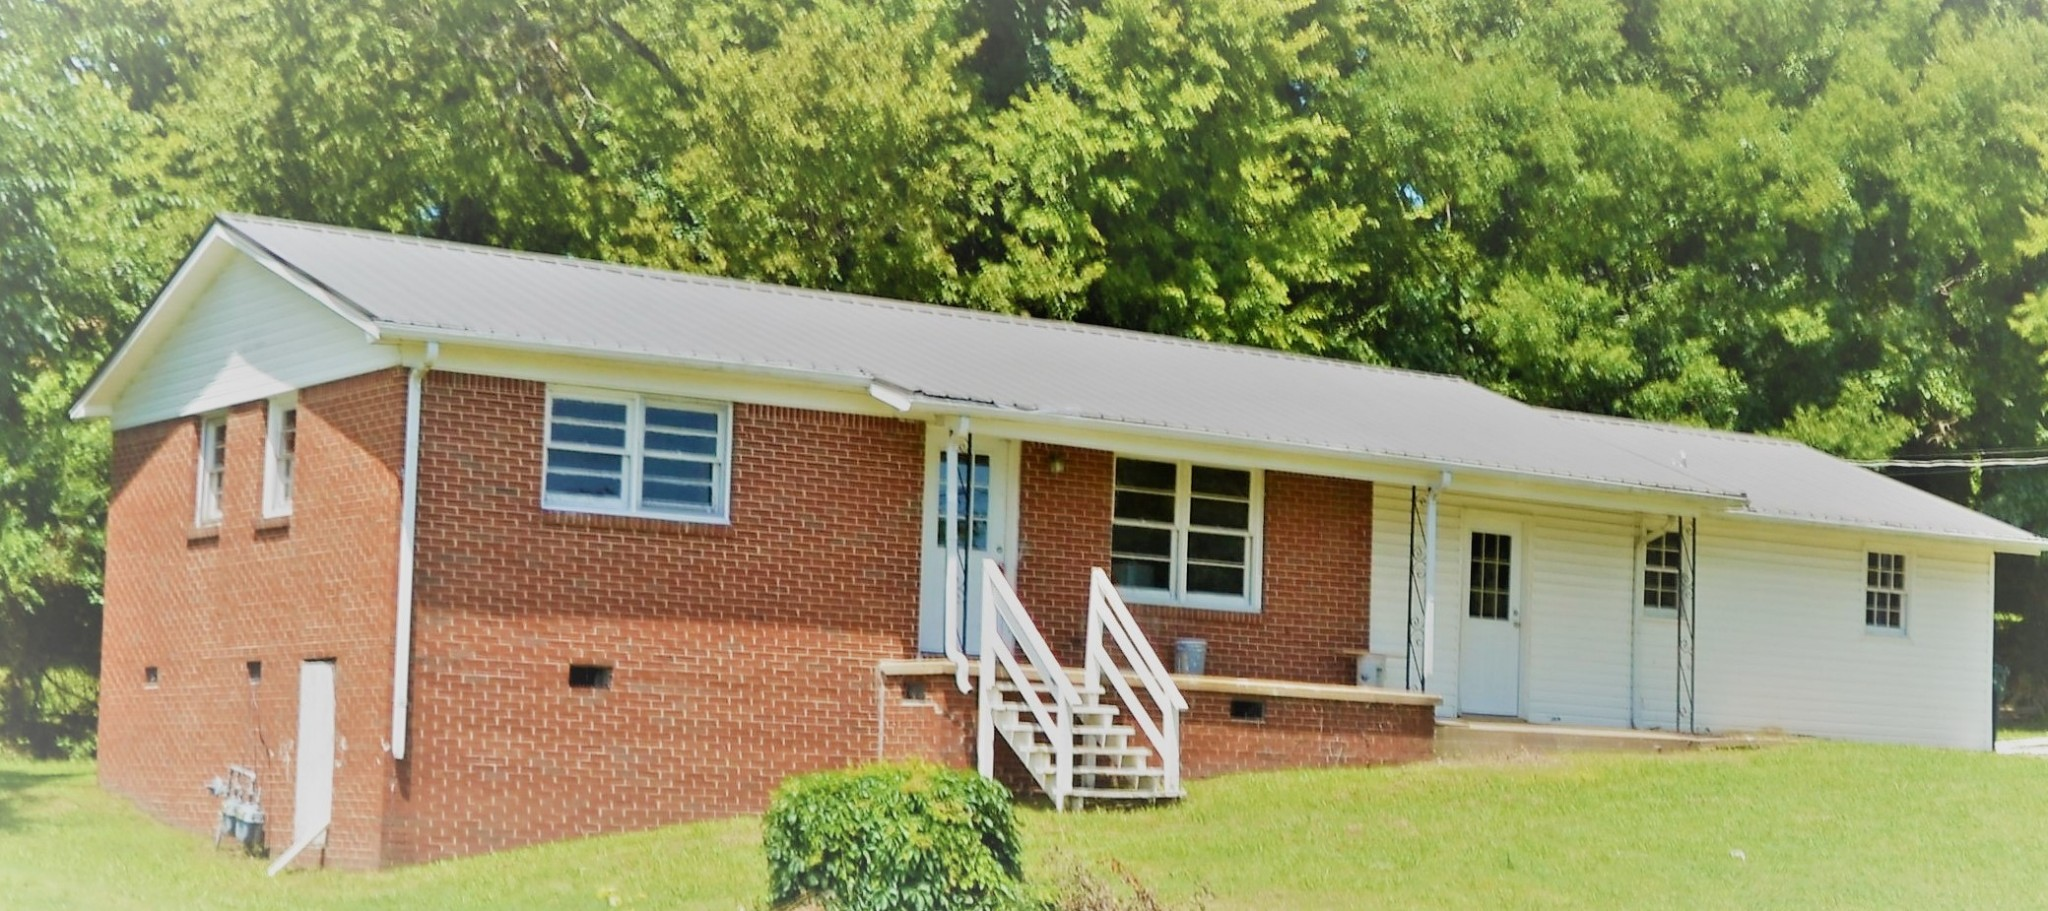 800 E Grigsby St Property Photo - Pulaski, TN real estate listing